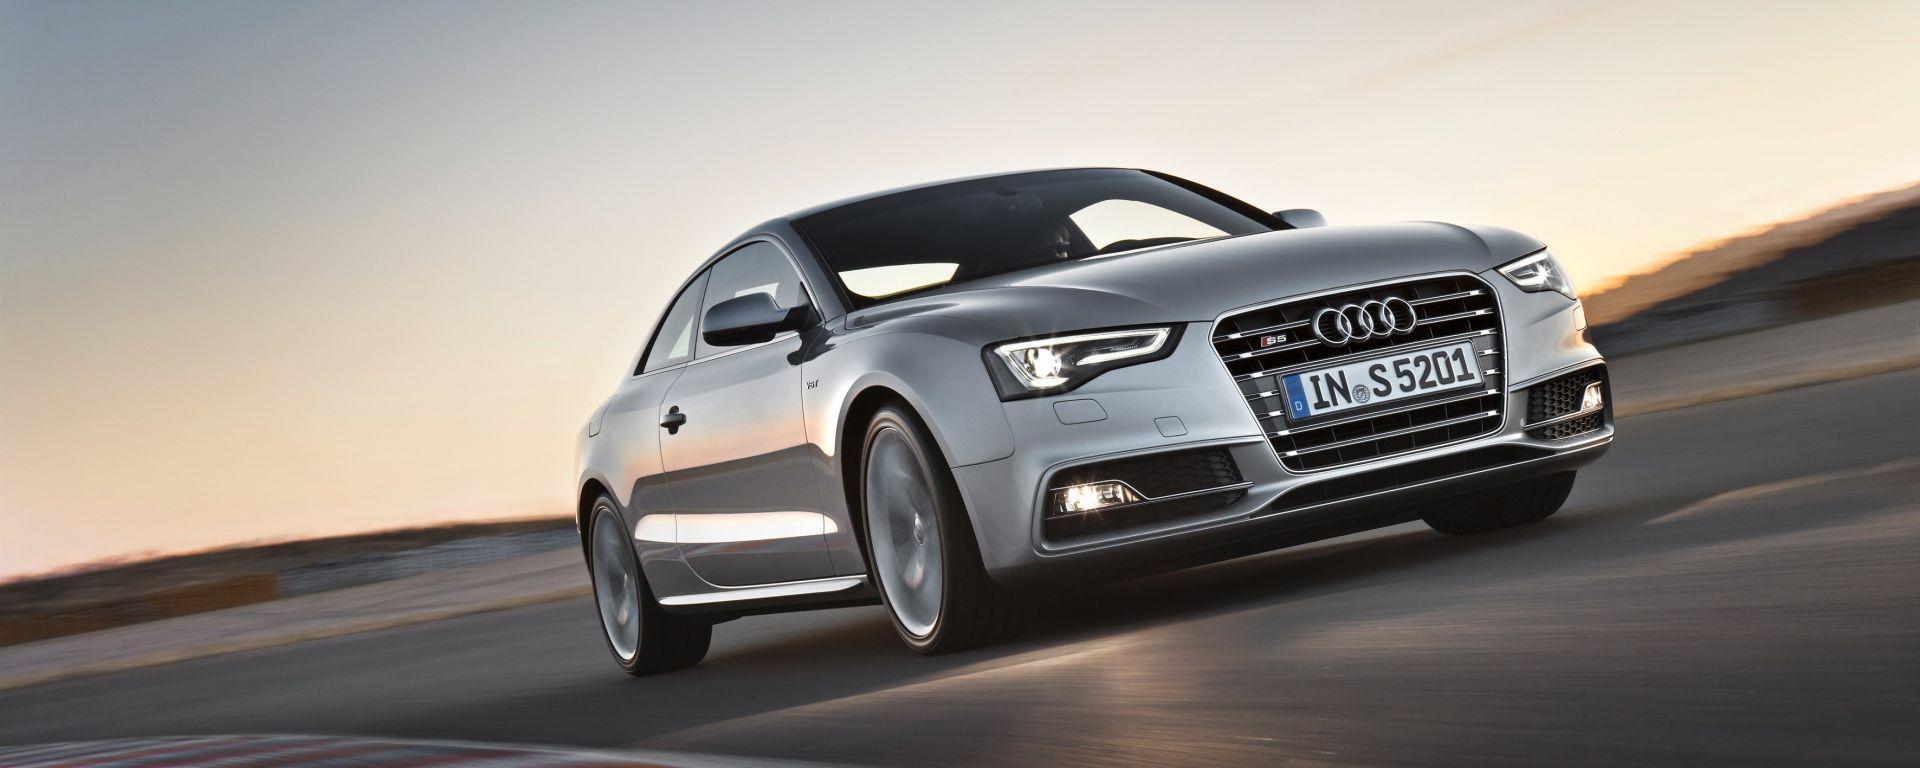 Audi A5 e S5 2012